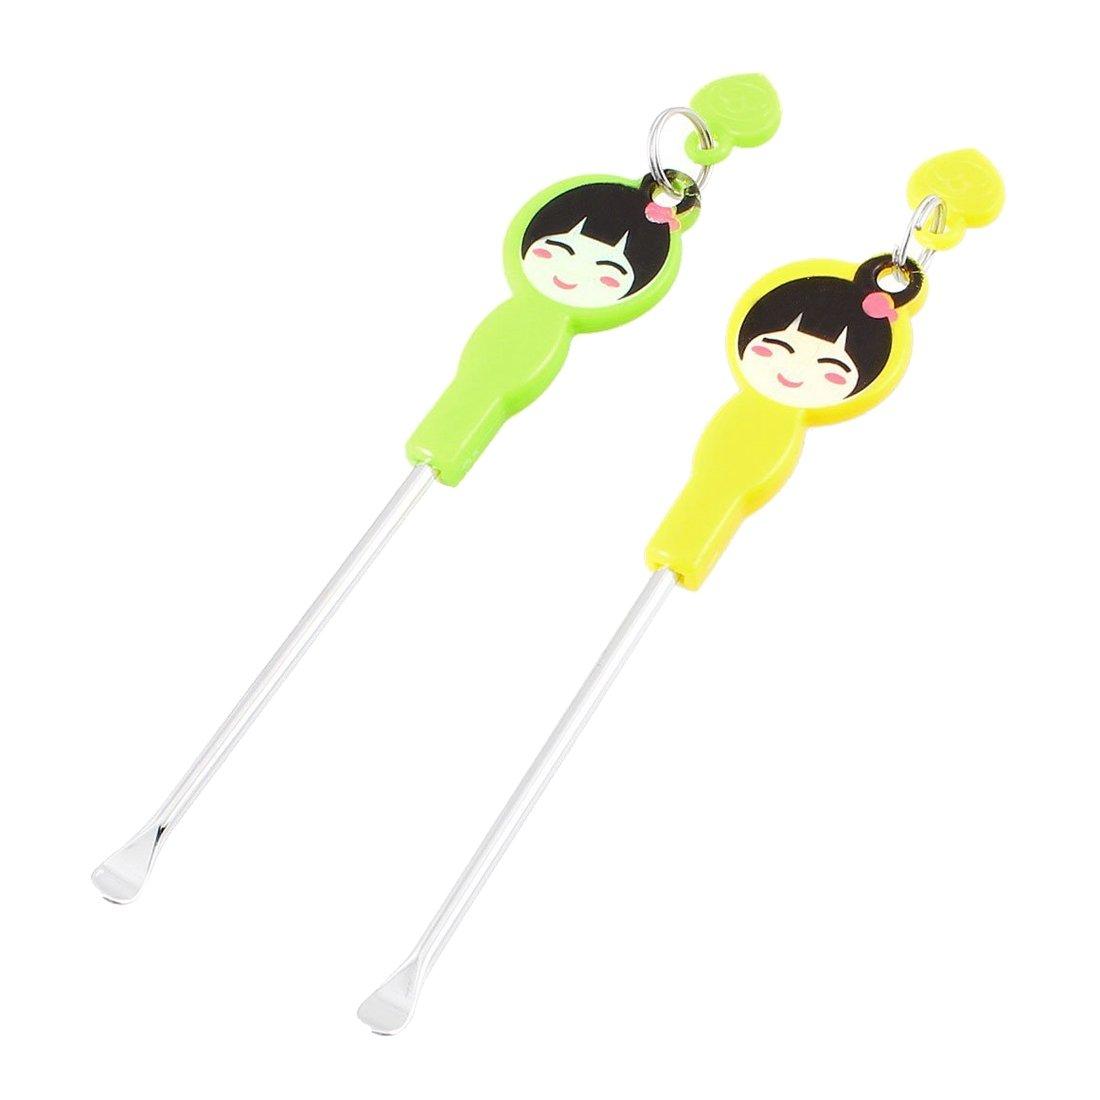 TOOGOO Cartoon Girl Pattern Ear Spoon Earwax Ear Wax Remover Ears Care Tool 2 Pcs